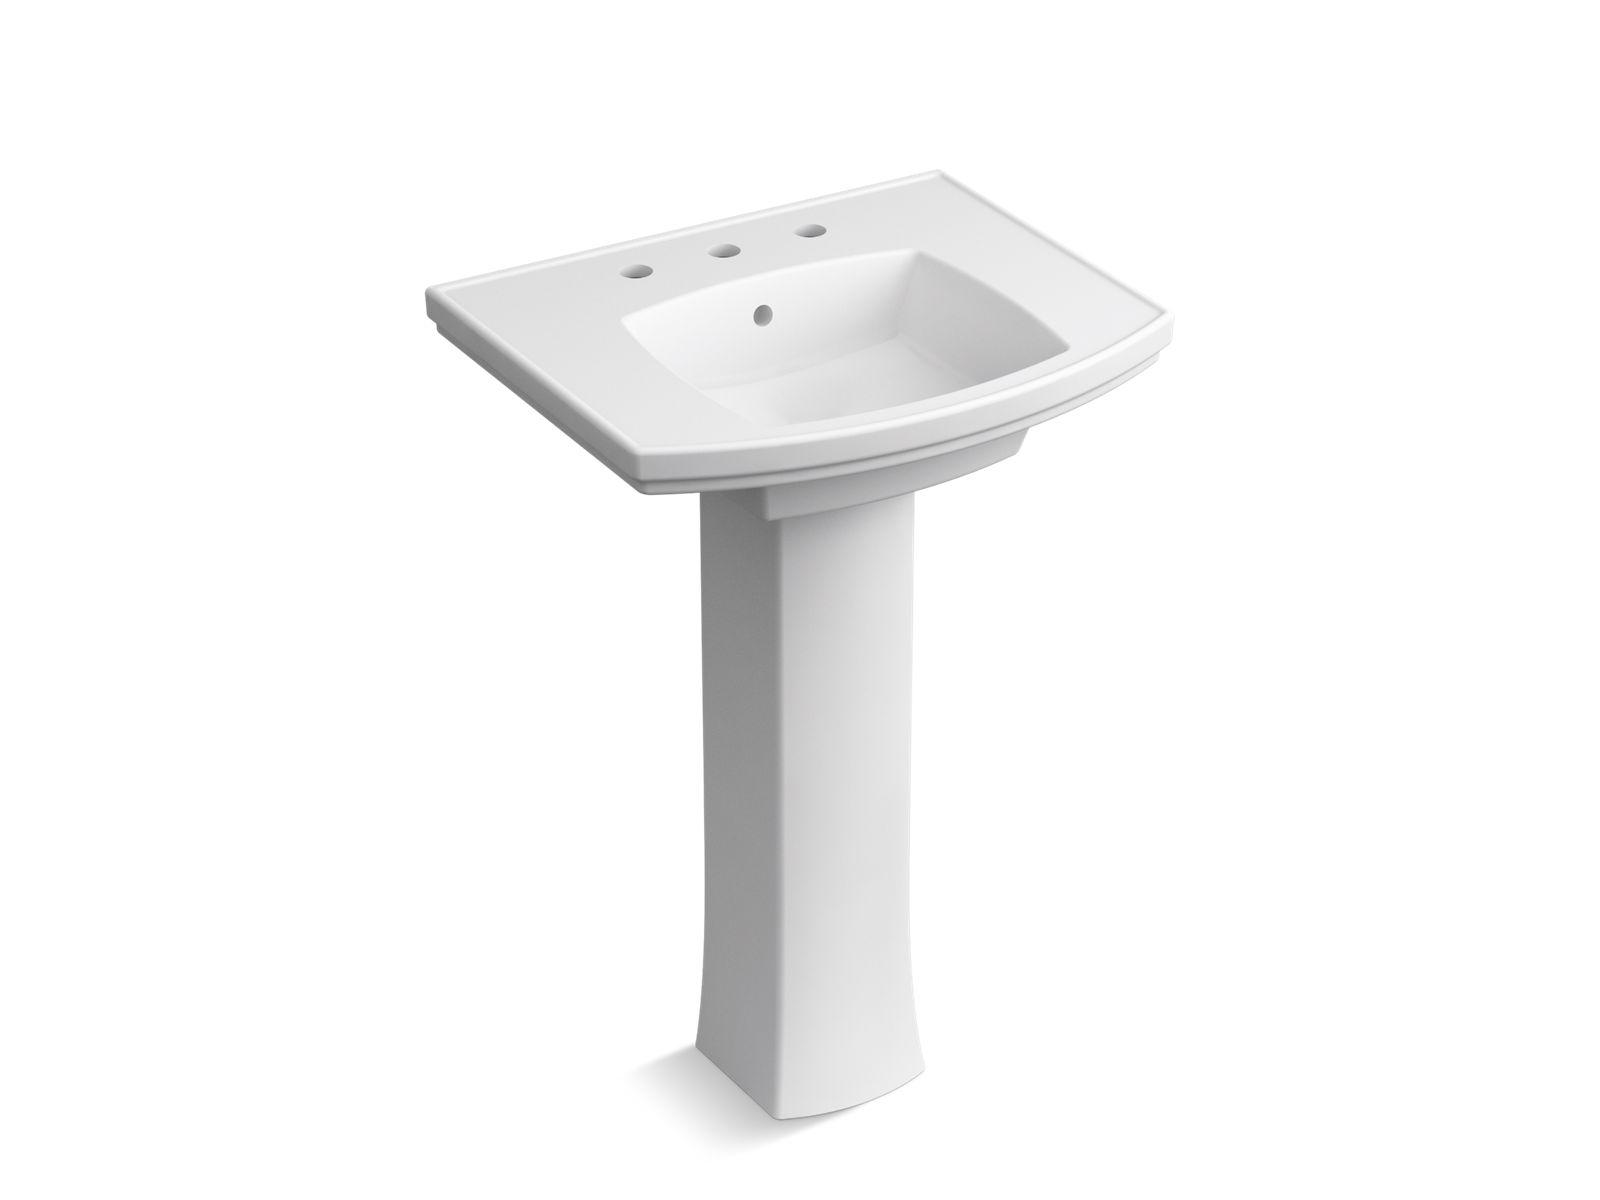 k r6376 8 elliston pedestal bathroom sink 8 inch widespread kohler